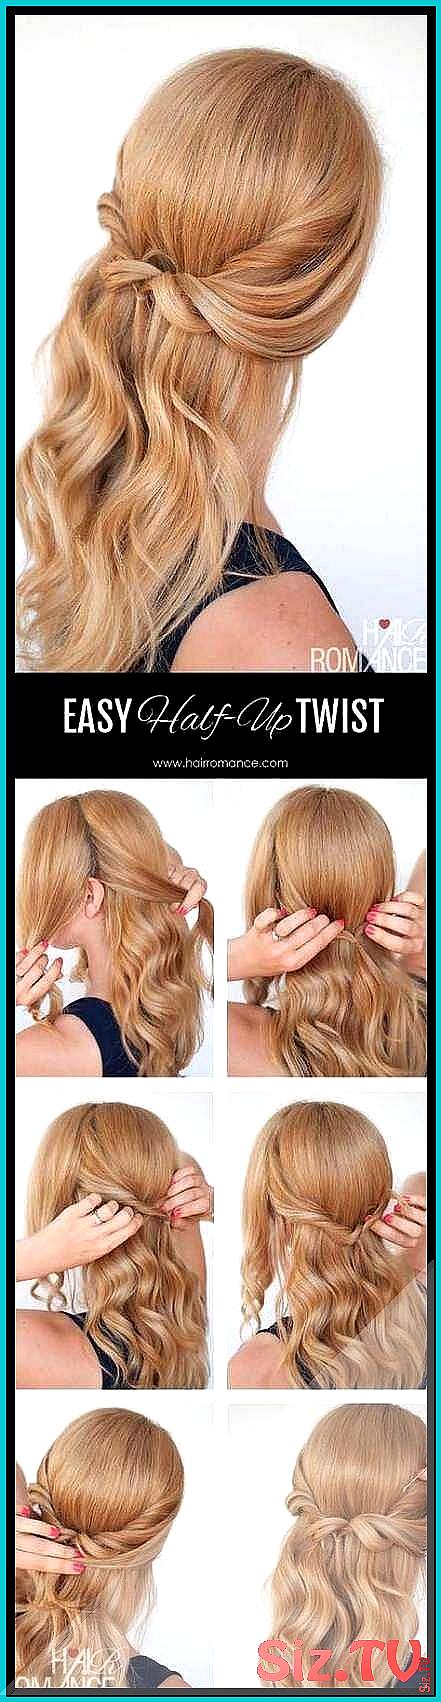 wedding hairstyles step by step Hochzeithairstyles